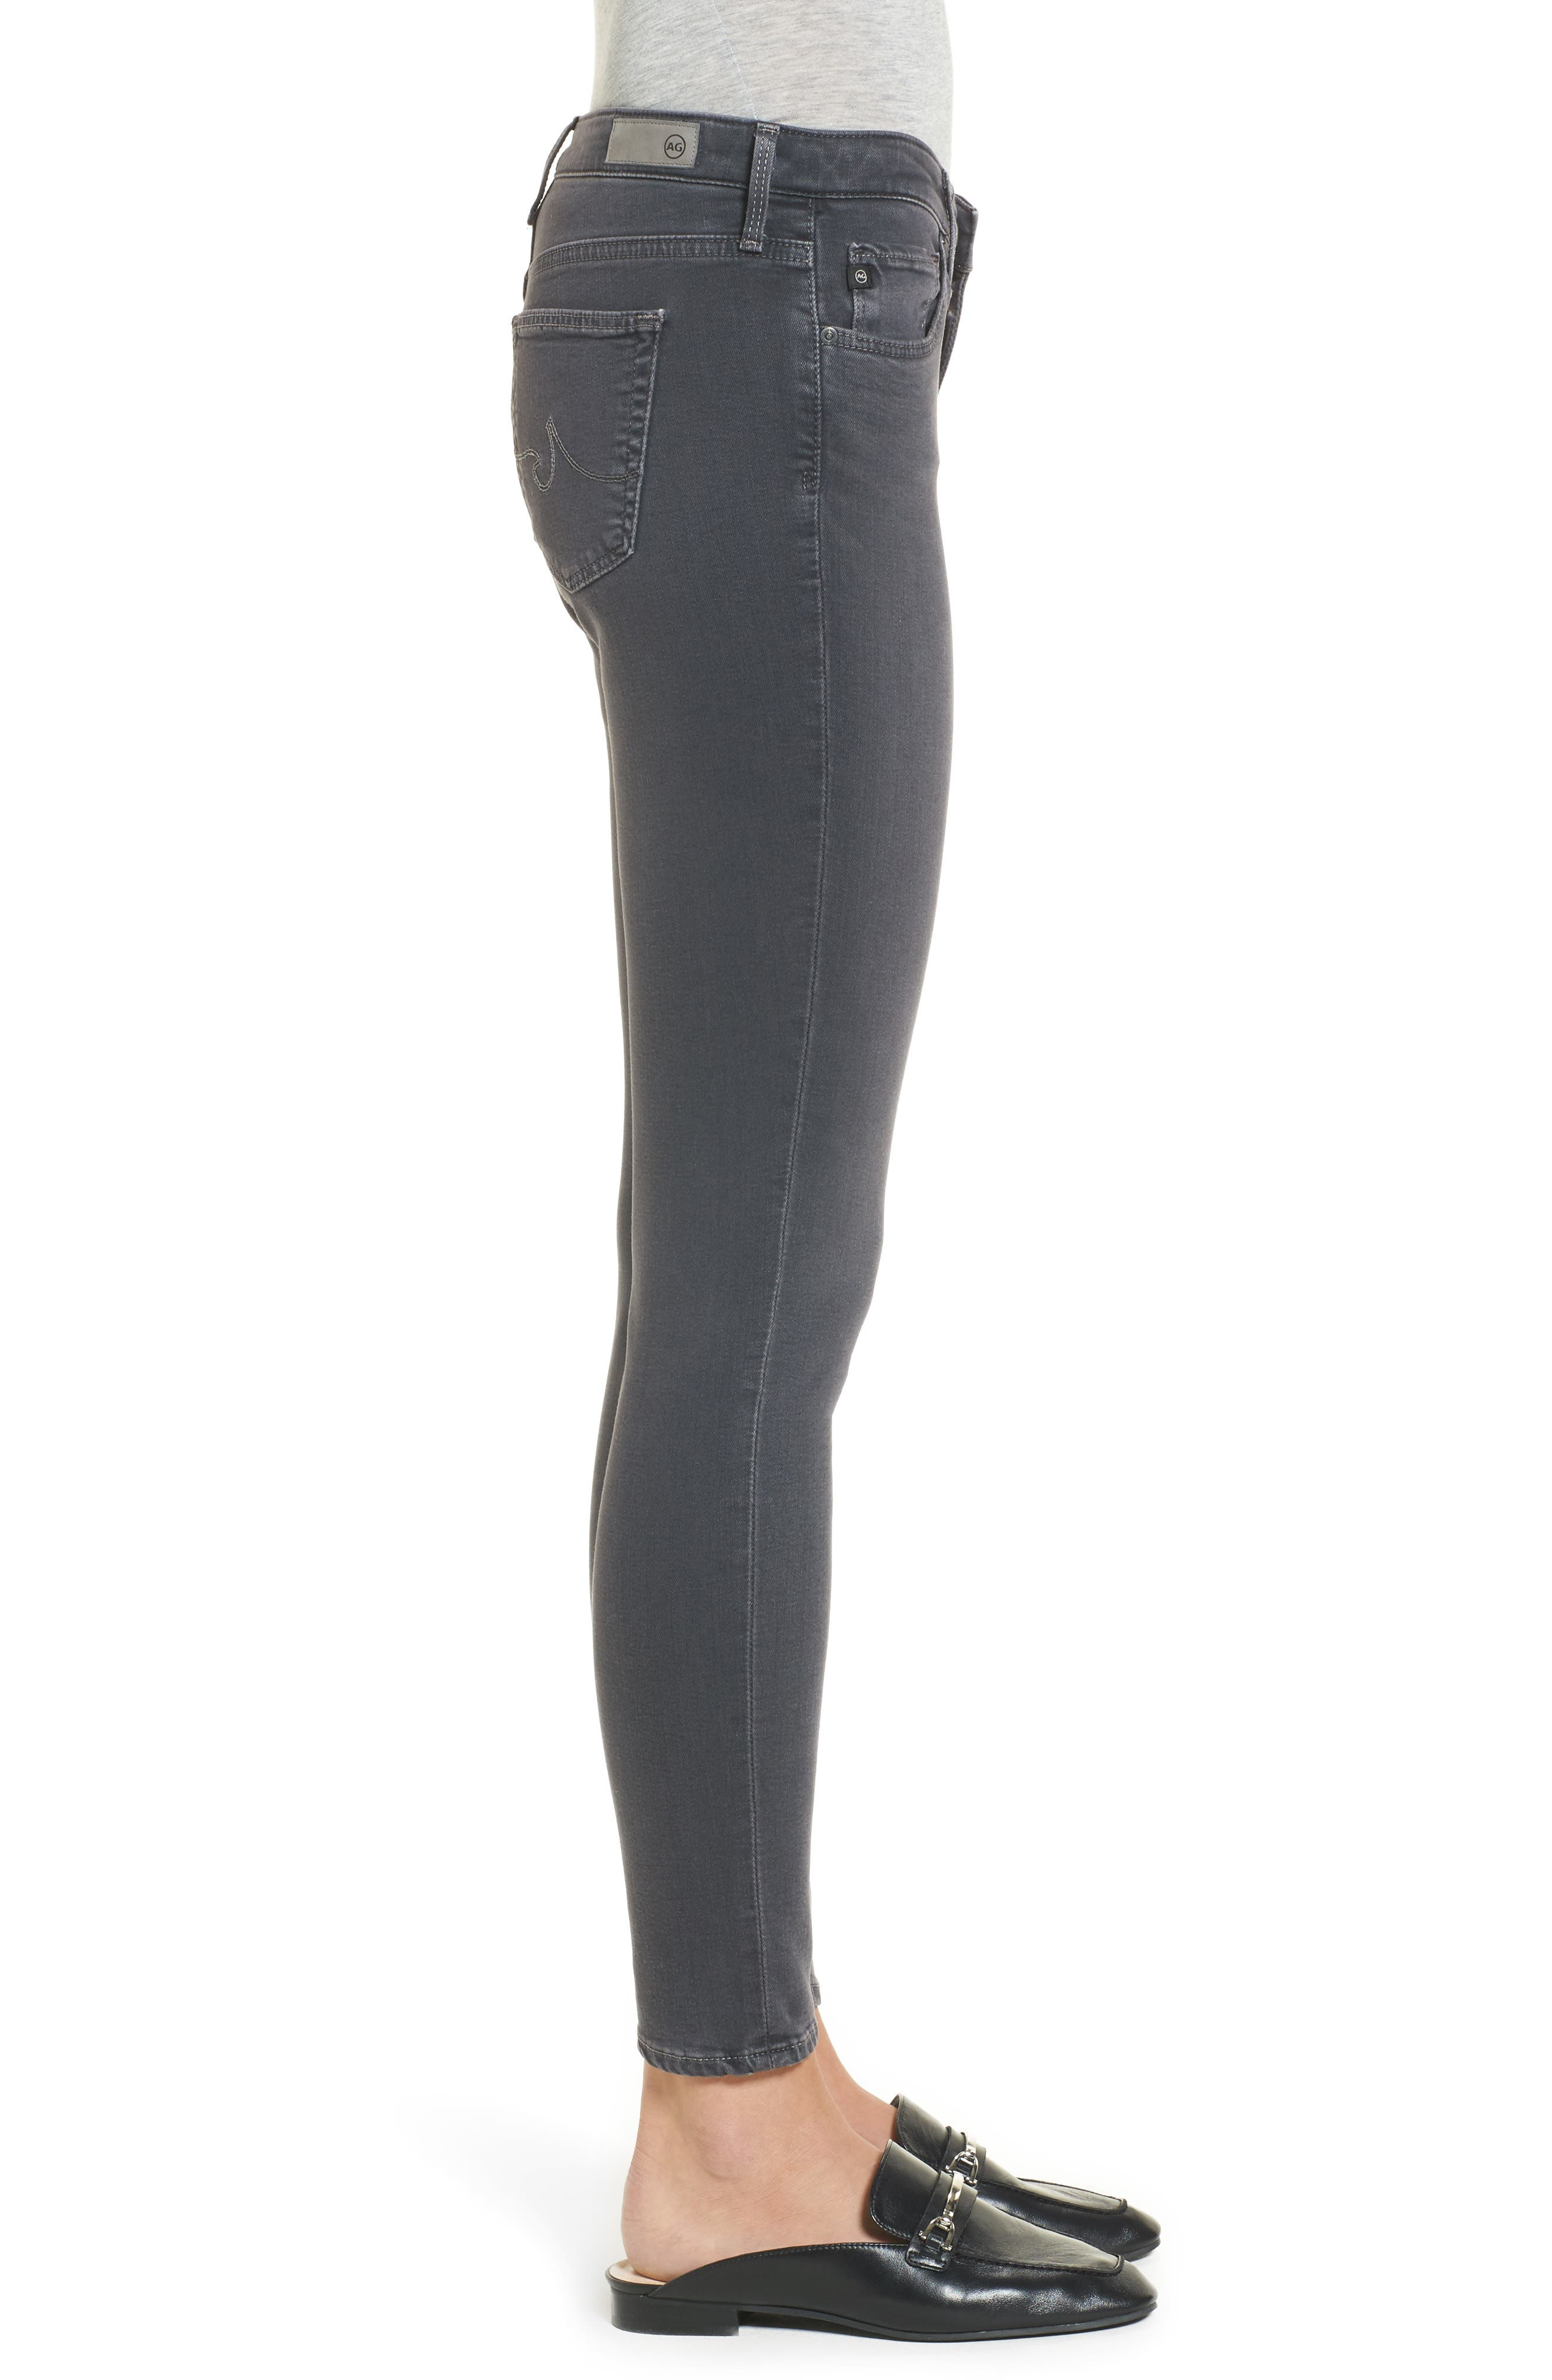 Ankle 'The Legging' Super Skinny Jeans,                             Alternate thumbnail 3, color,                             Raven Plume